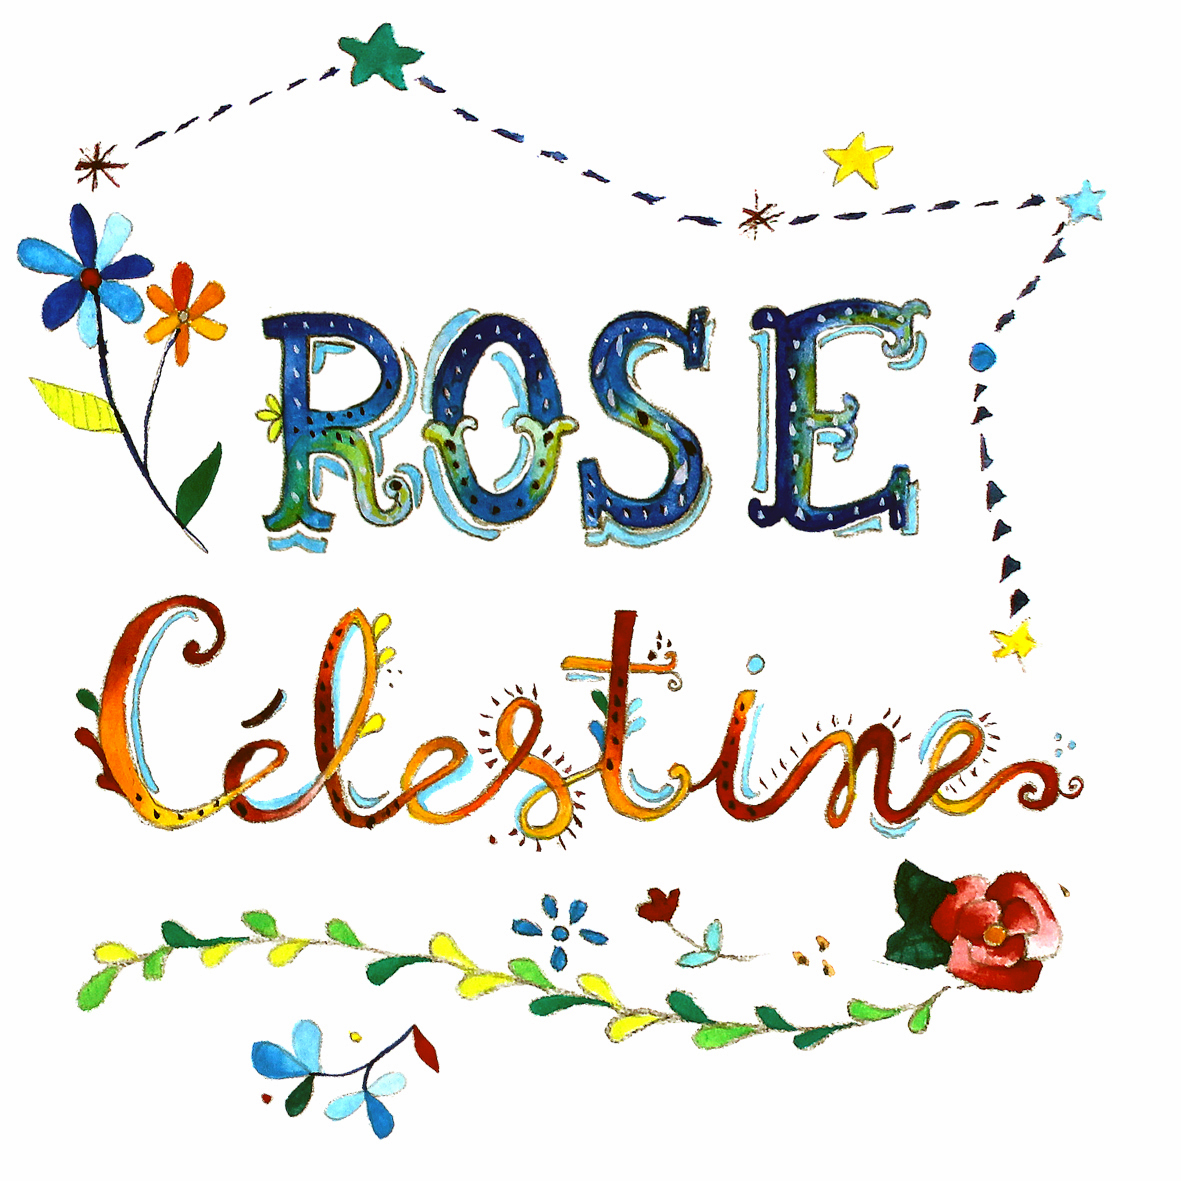 rose célestine logo